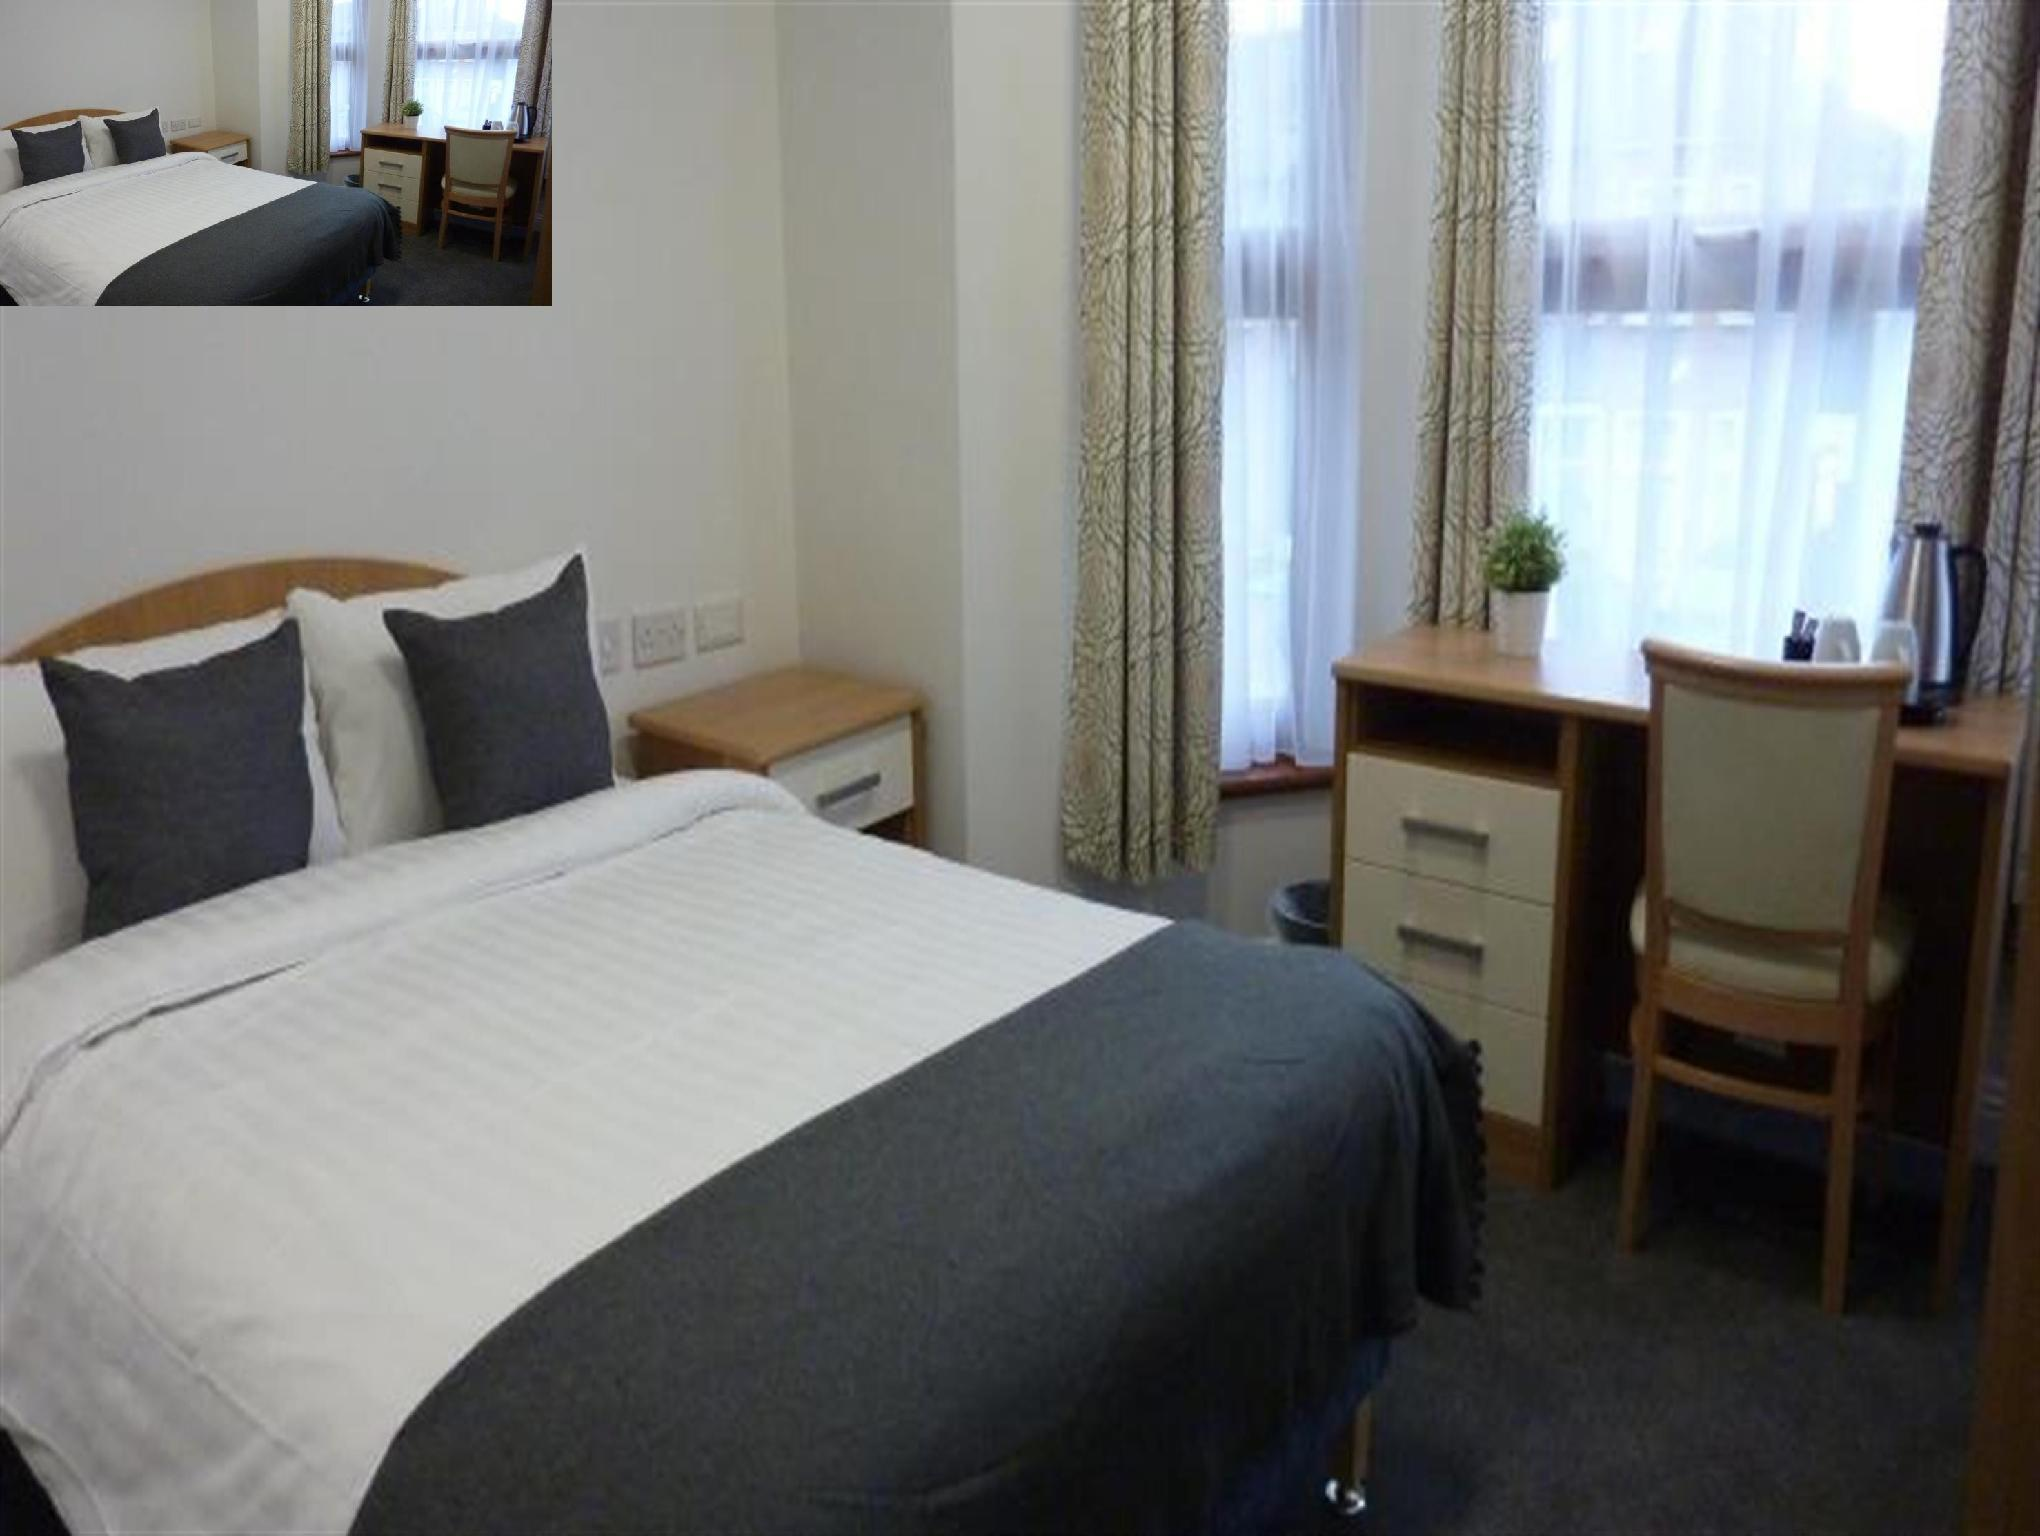 Rosalee Hotel, London